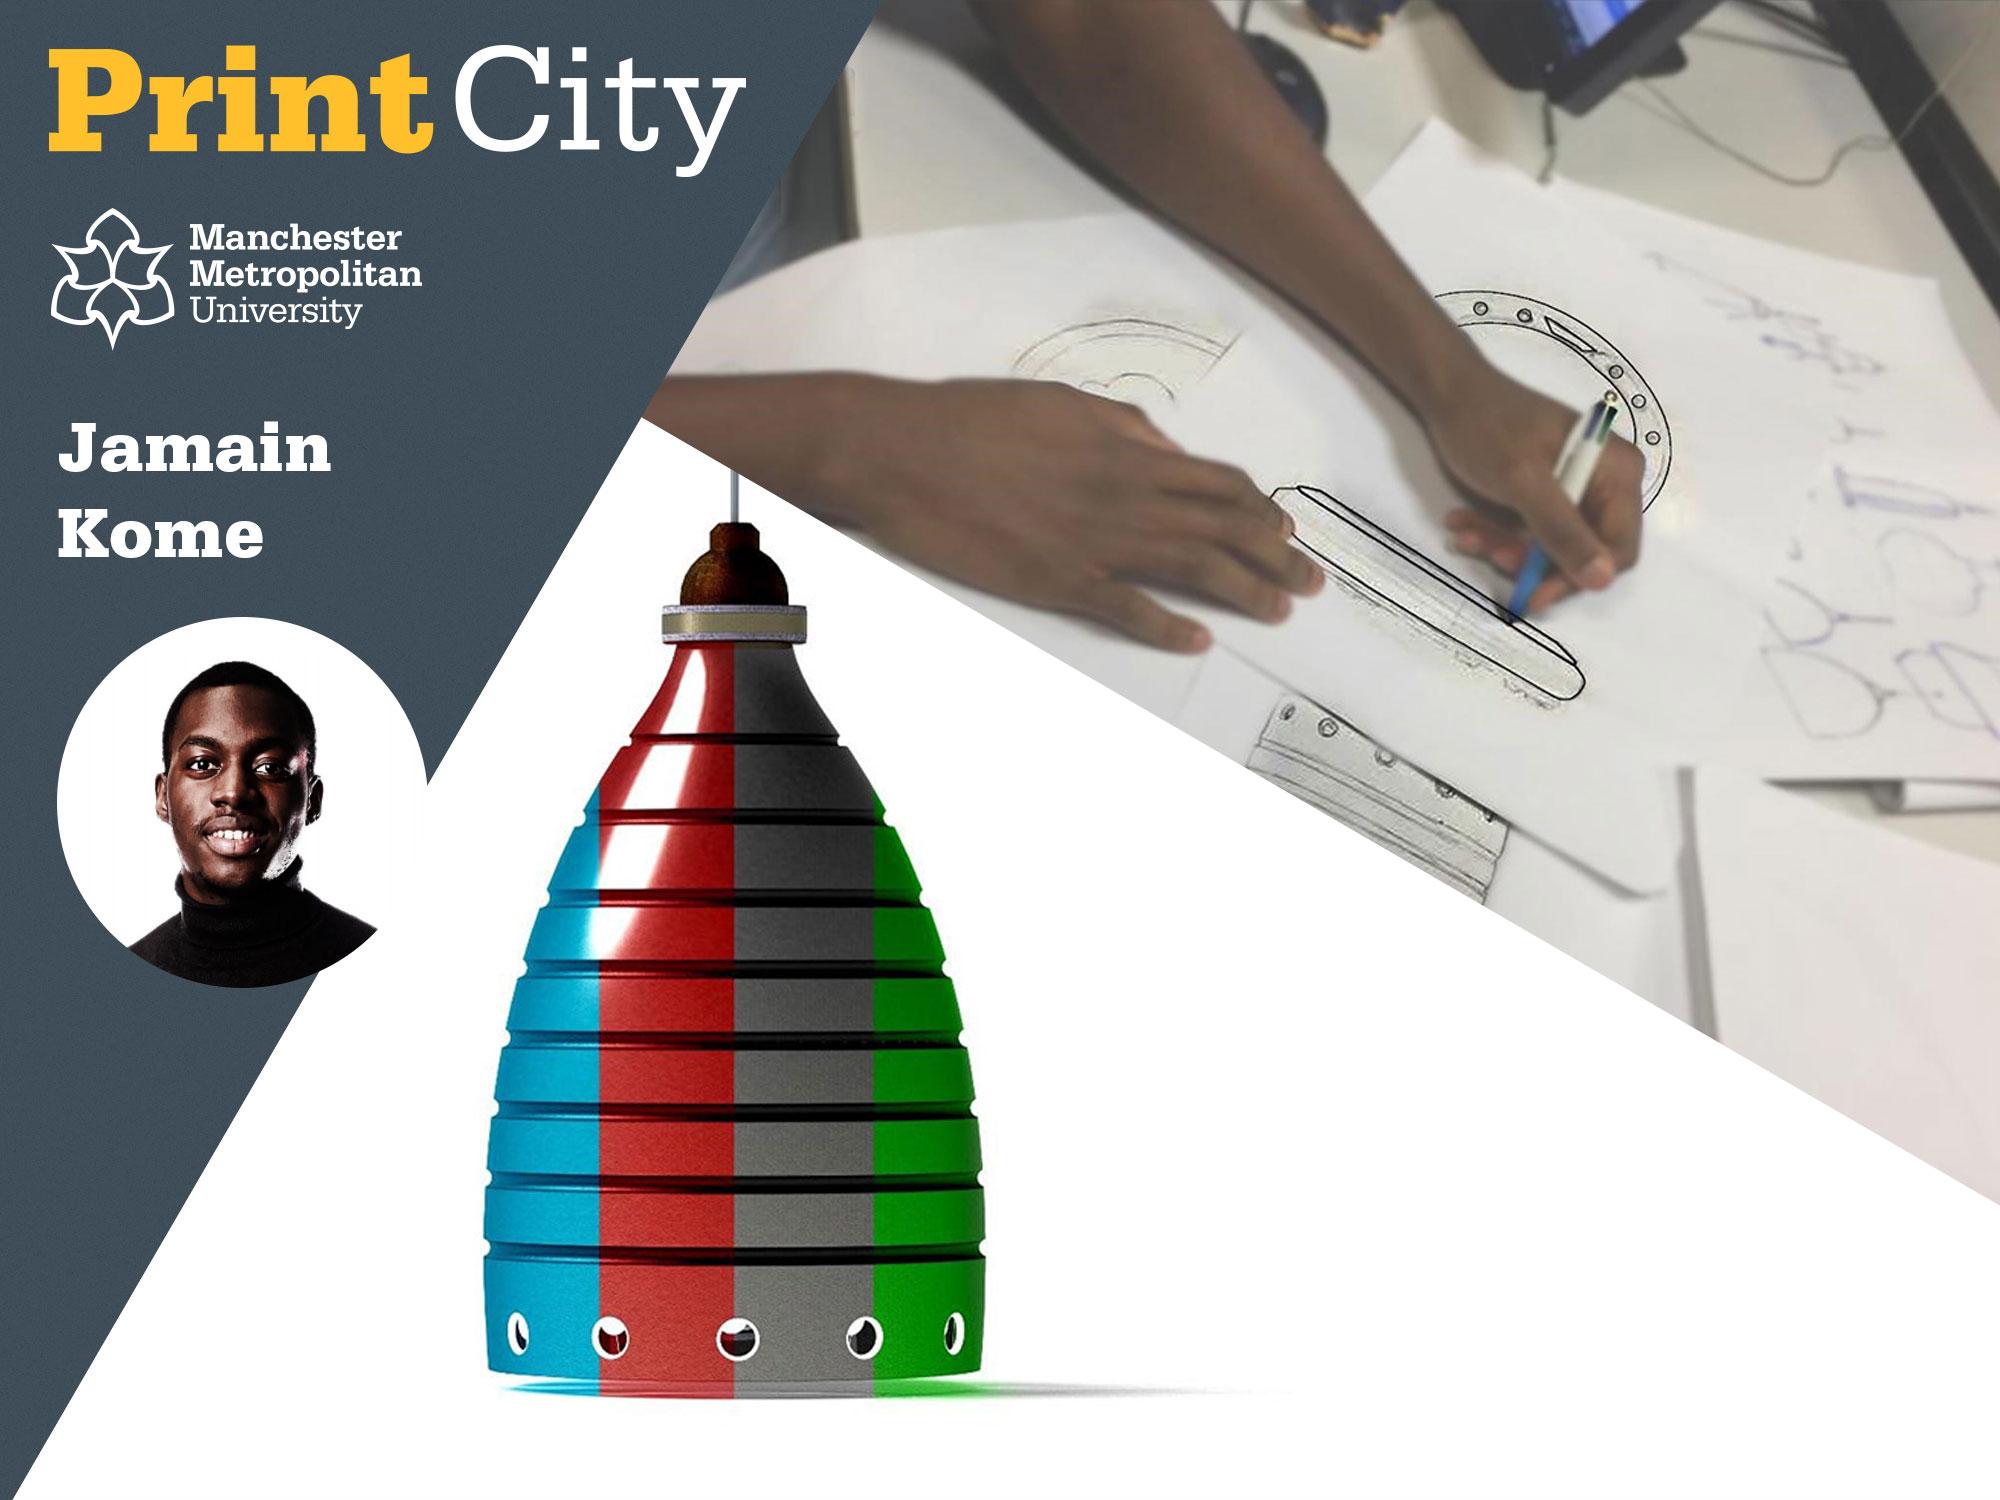 Jamain Kome - Student Profile - PrintCity - Manchester Metropolitan University